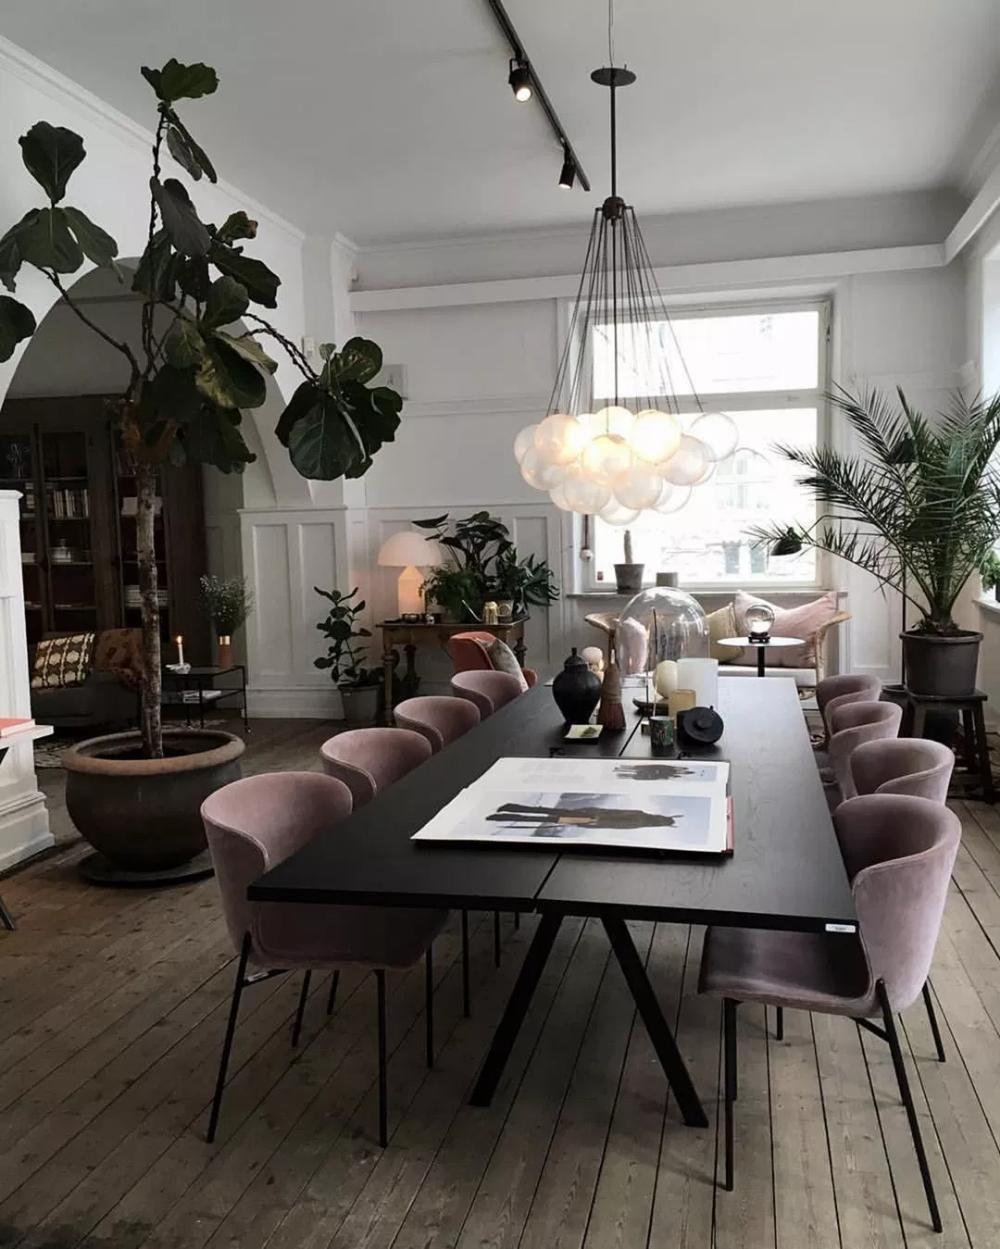 30 Modern Home Decor Ideas: Gorgeous 30 Modern Minimalist Dining Room Design Ideas For